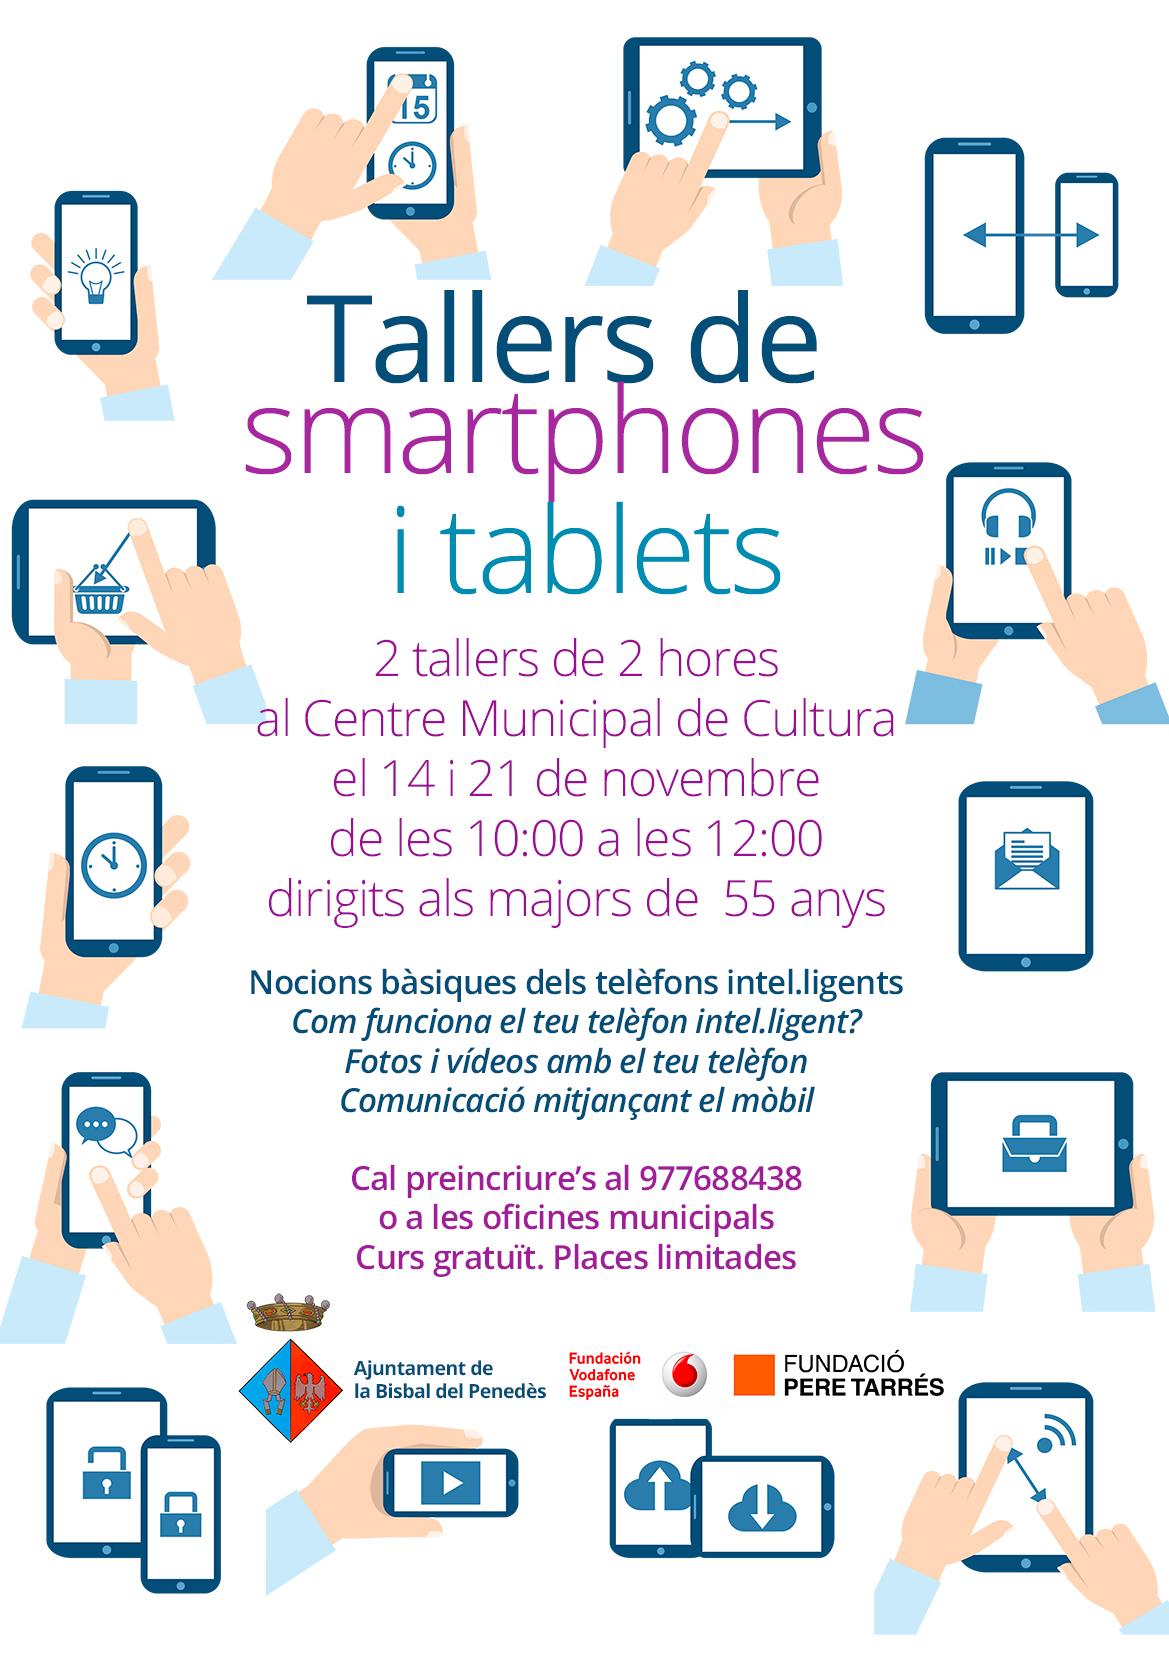 Taller de Smartphones i tablets